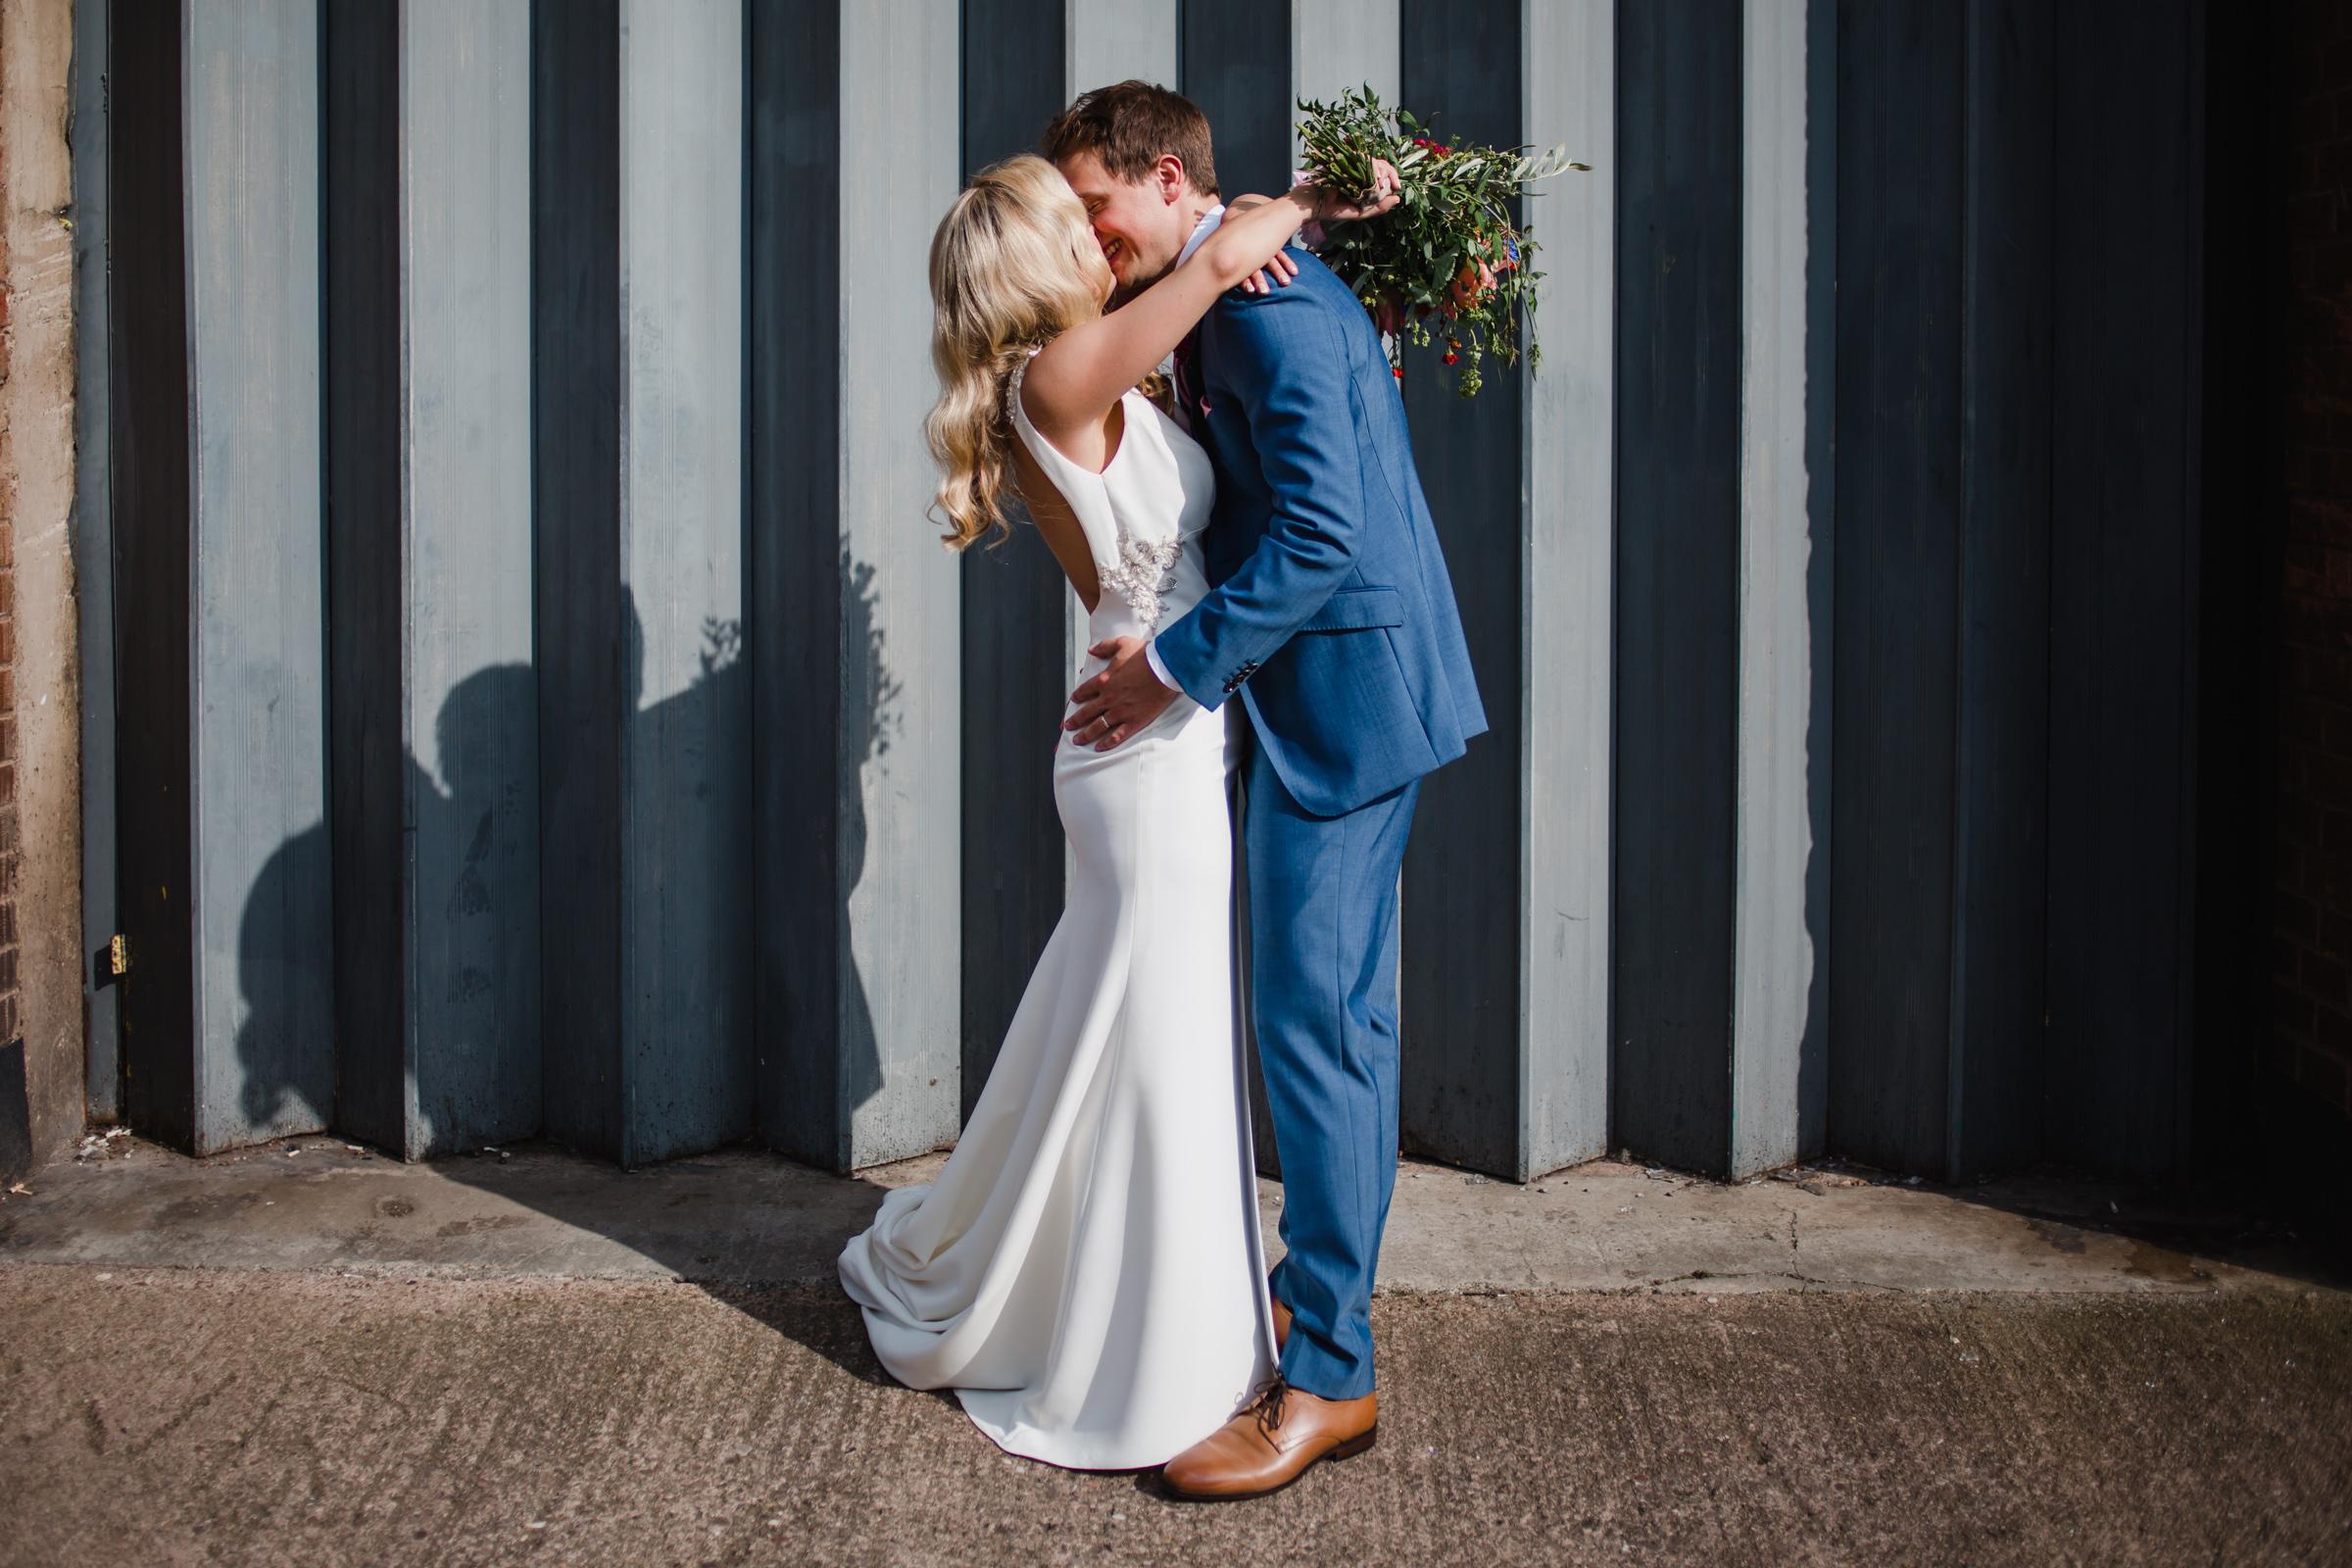 a bride and groom kiss in front of an industrial shutter door in digbeth Birmingham